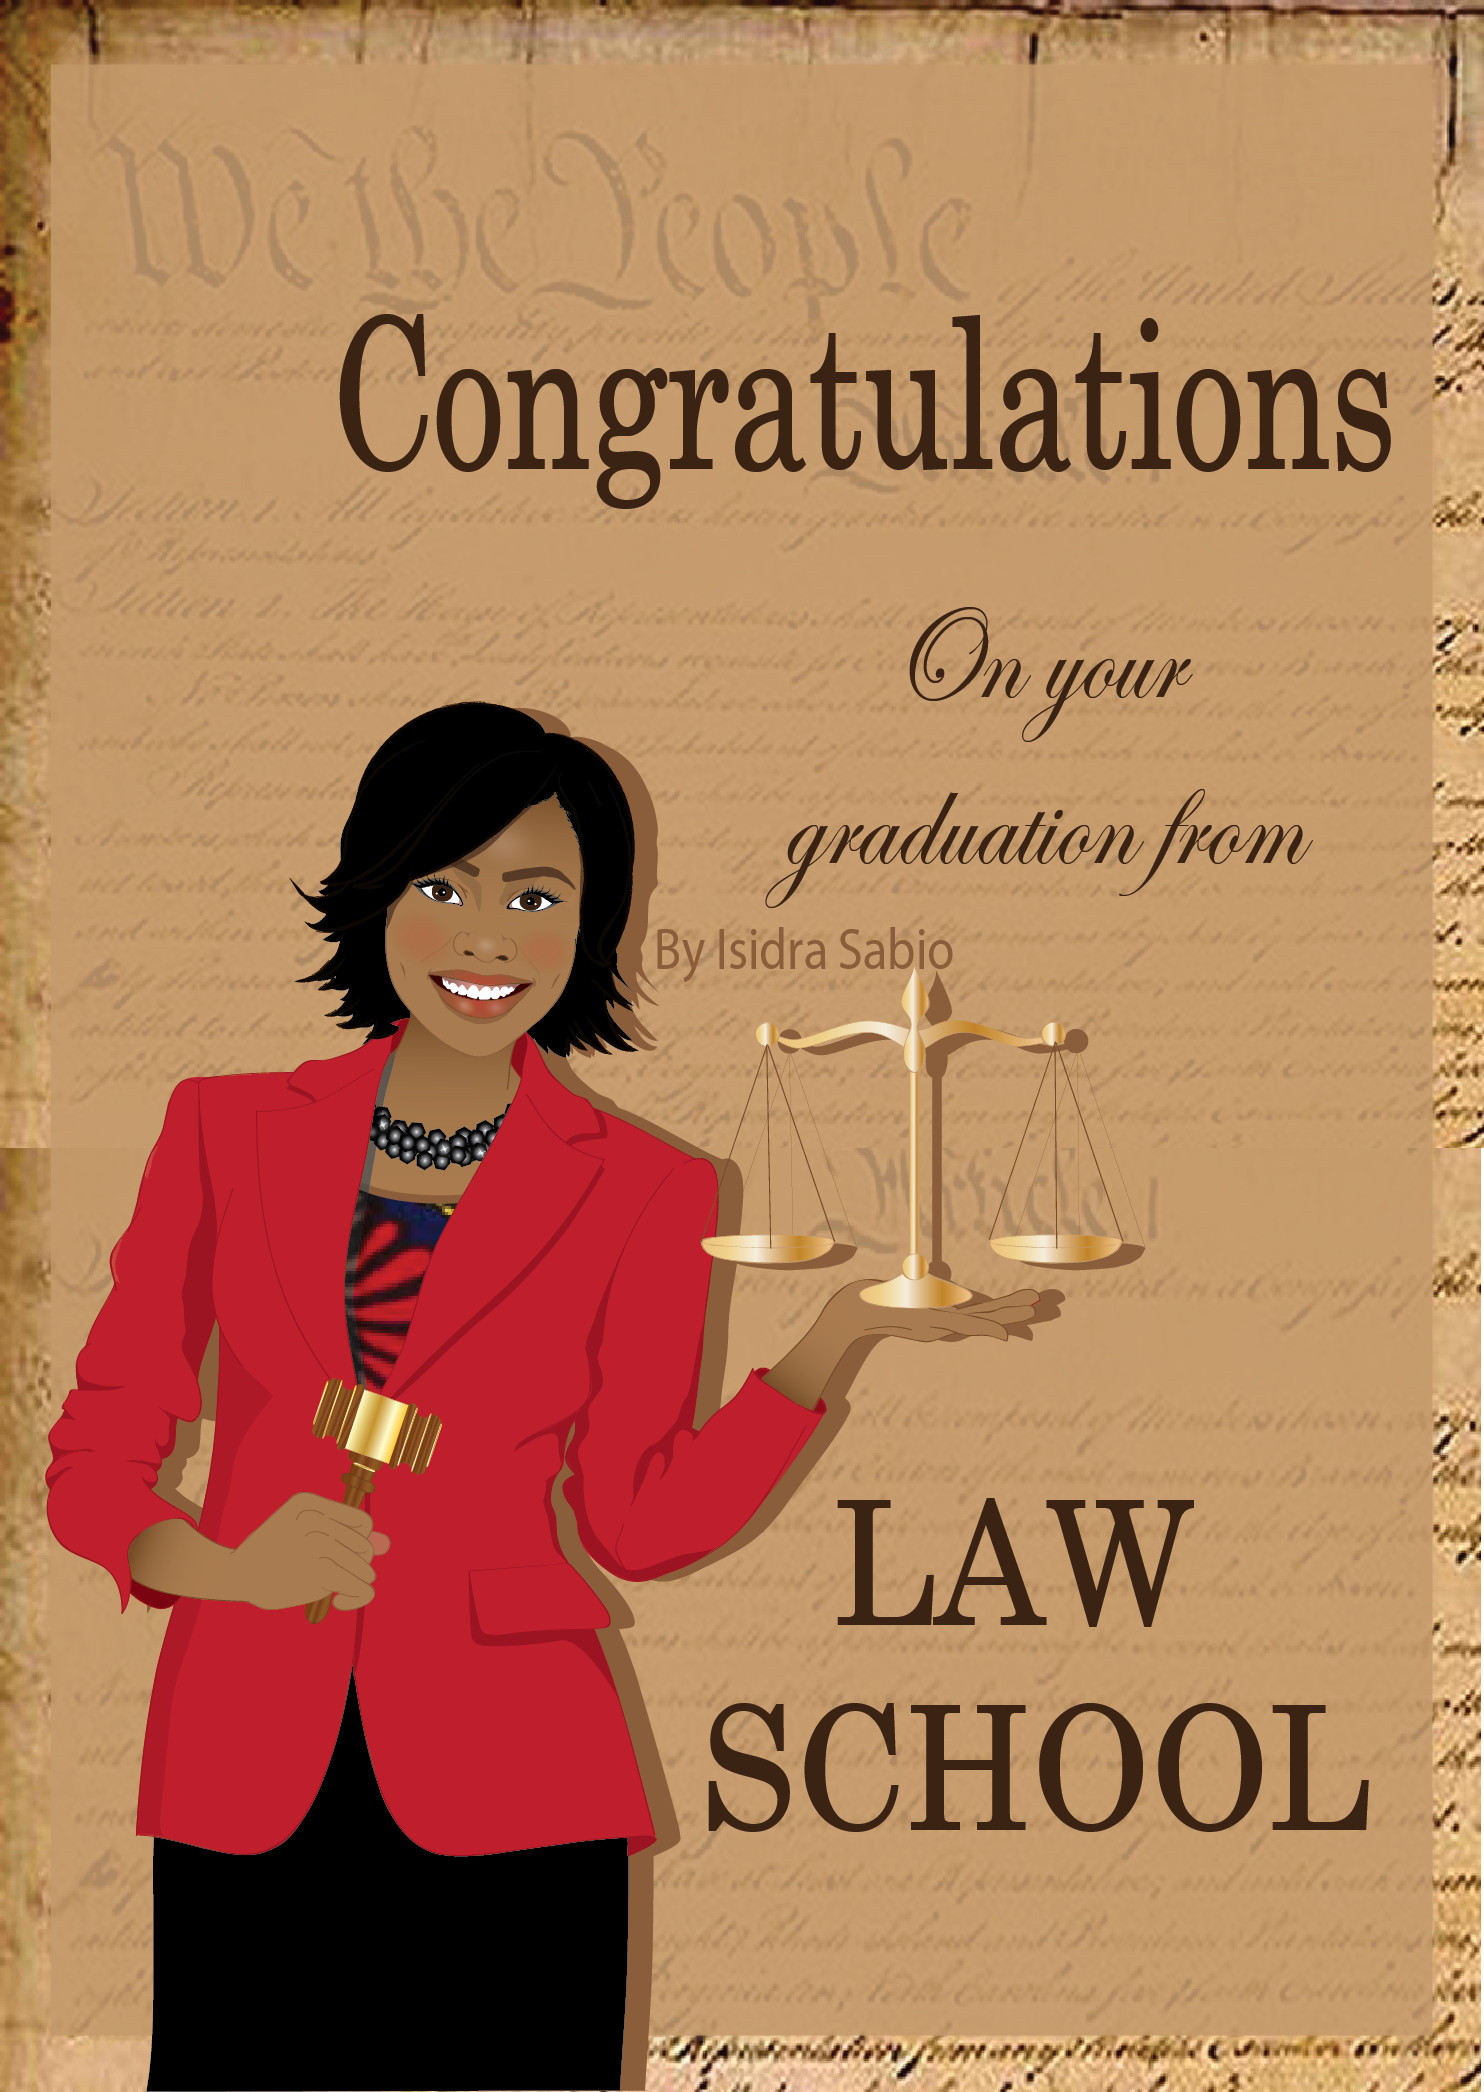 Law School Graduation Quotes  Graduation Congratulations on your Law School Degree